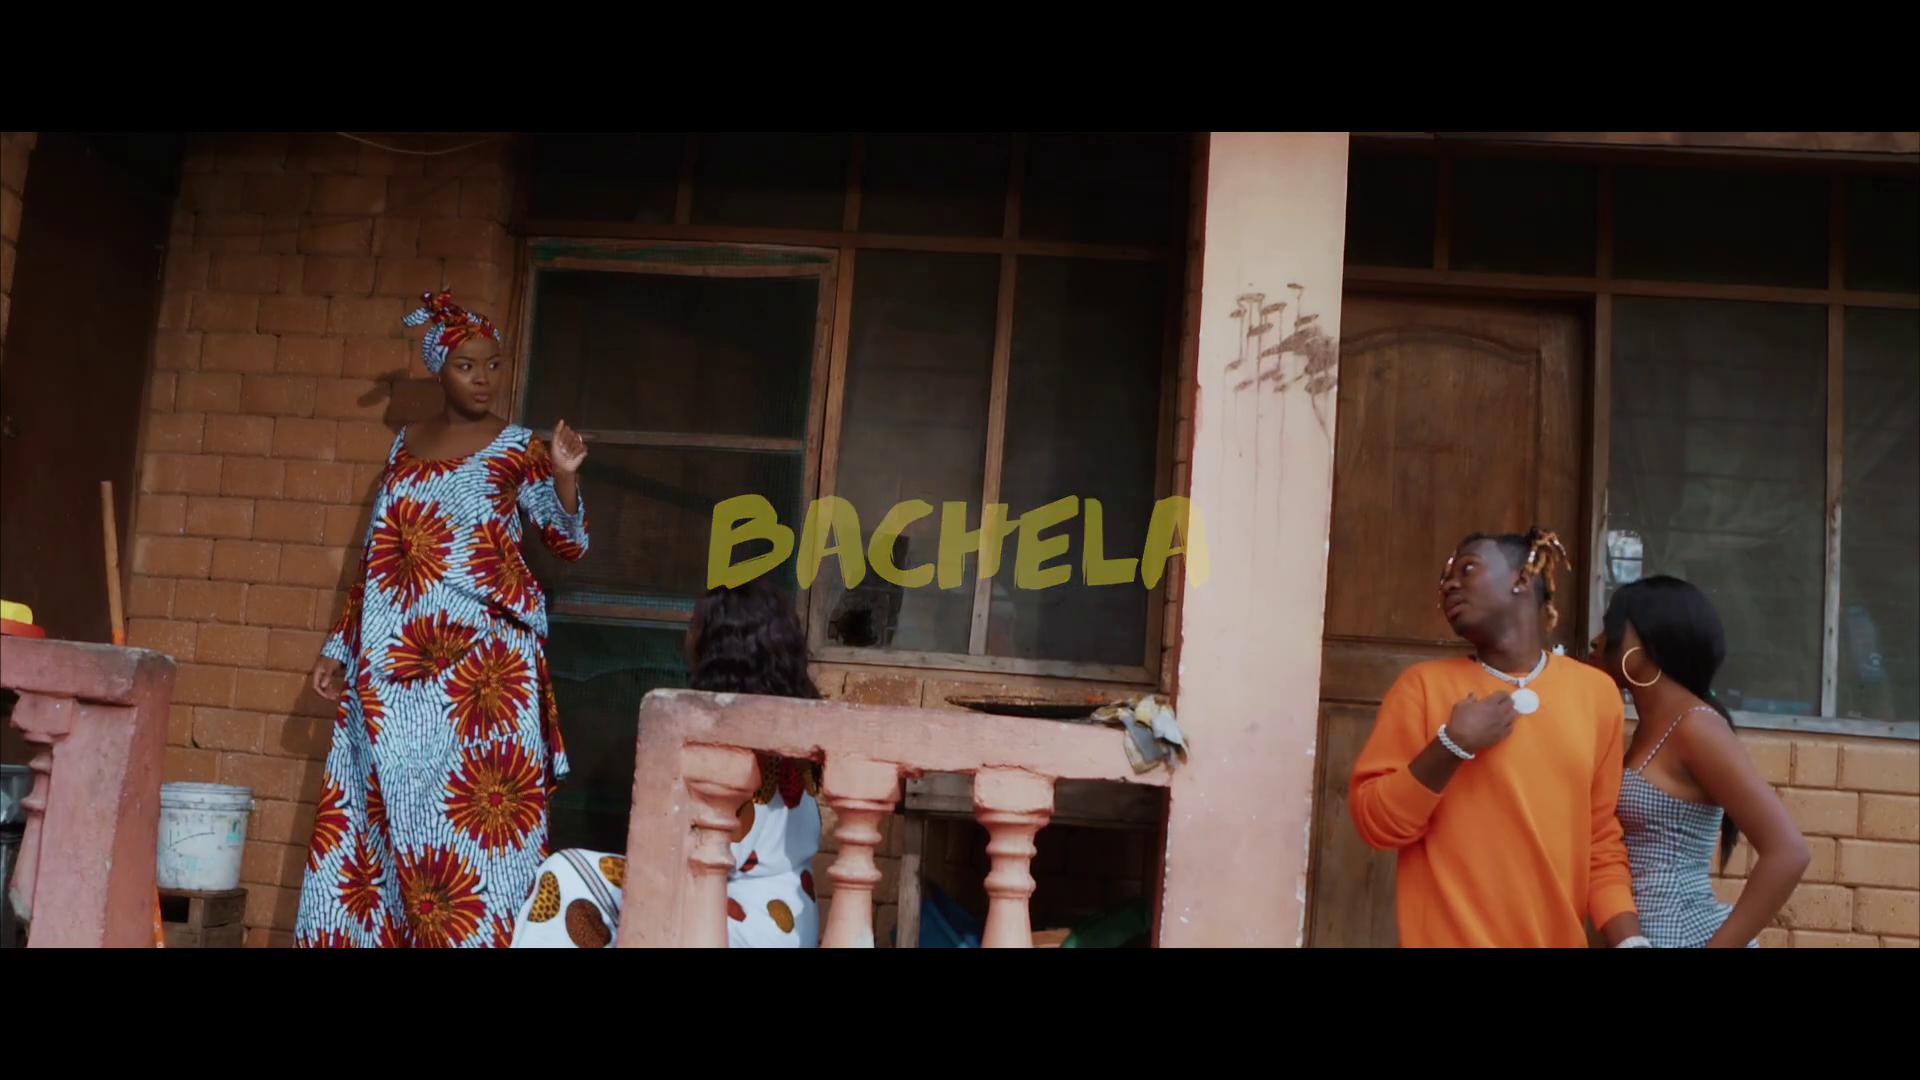 VIDEO | Queen Darleen Ft. Lava Lava - Bachela - DJ Mwanga